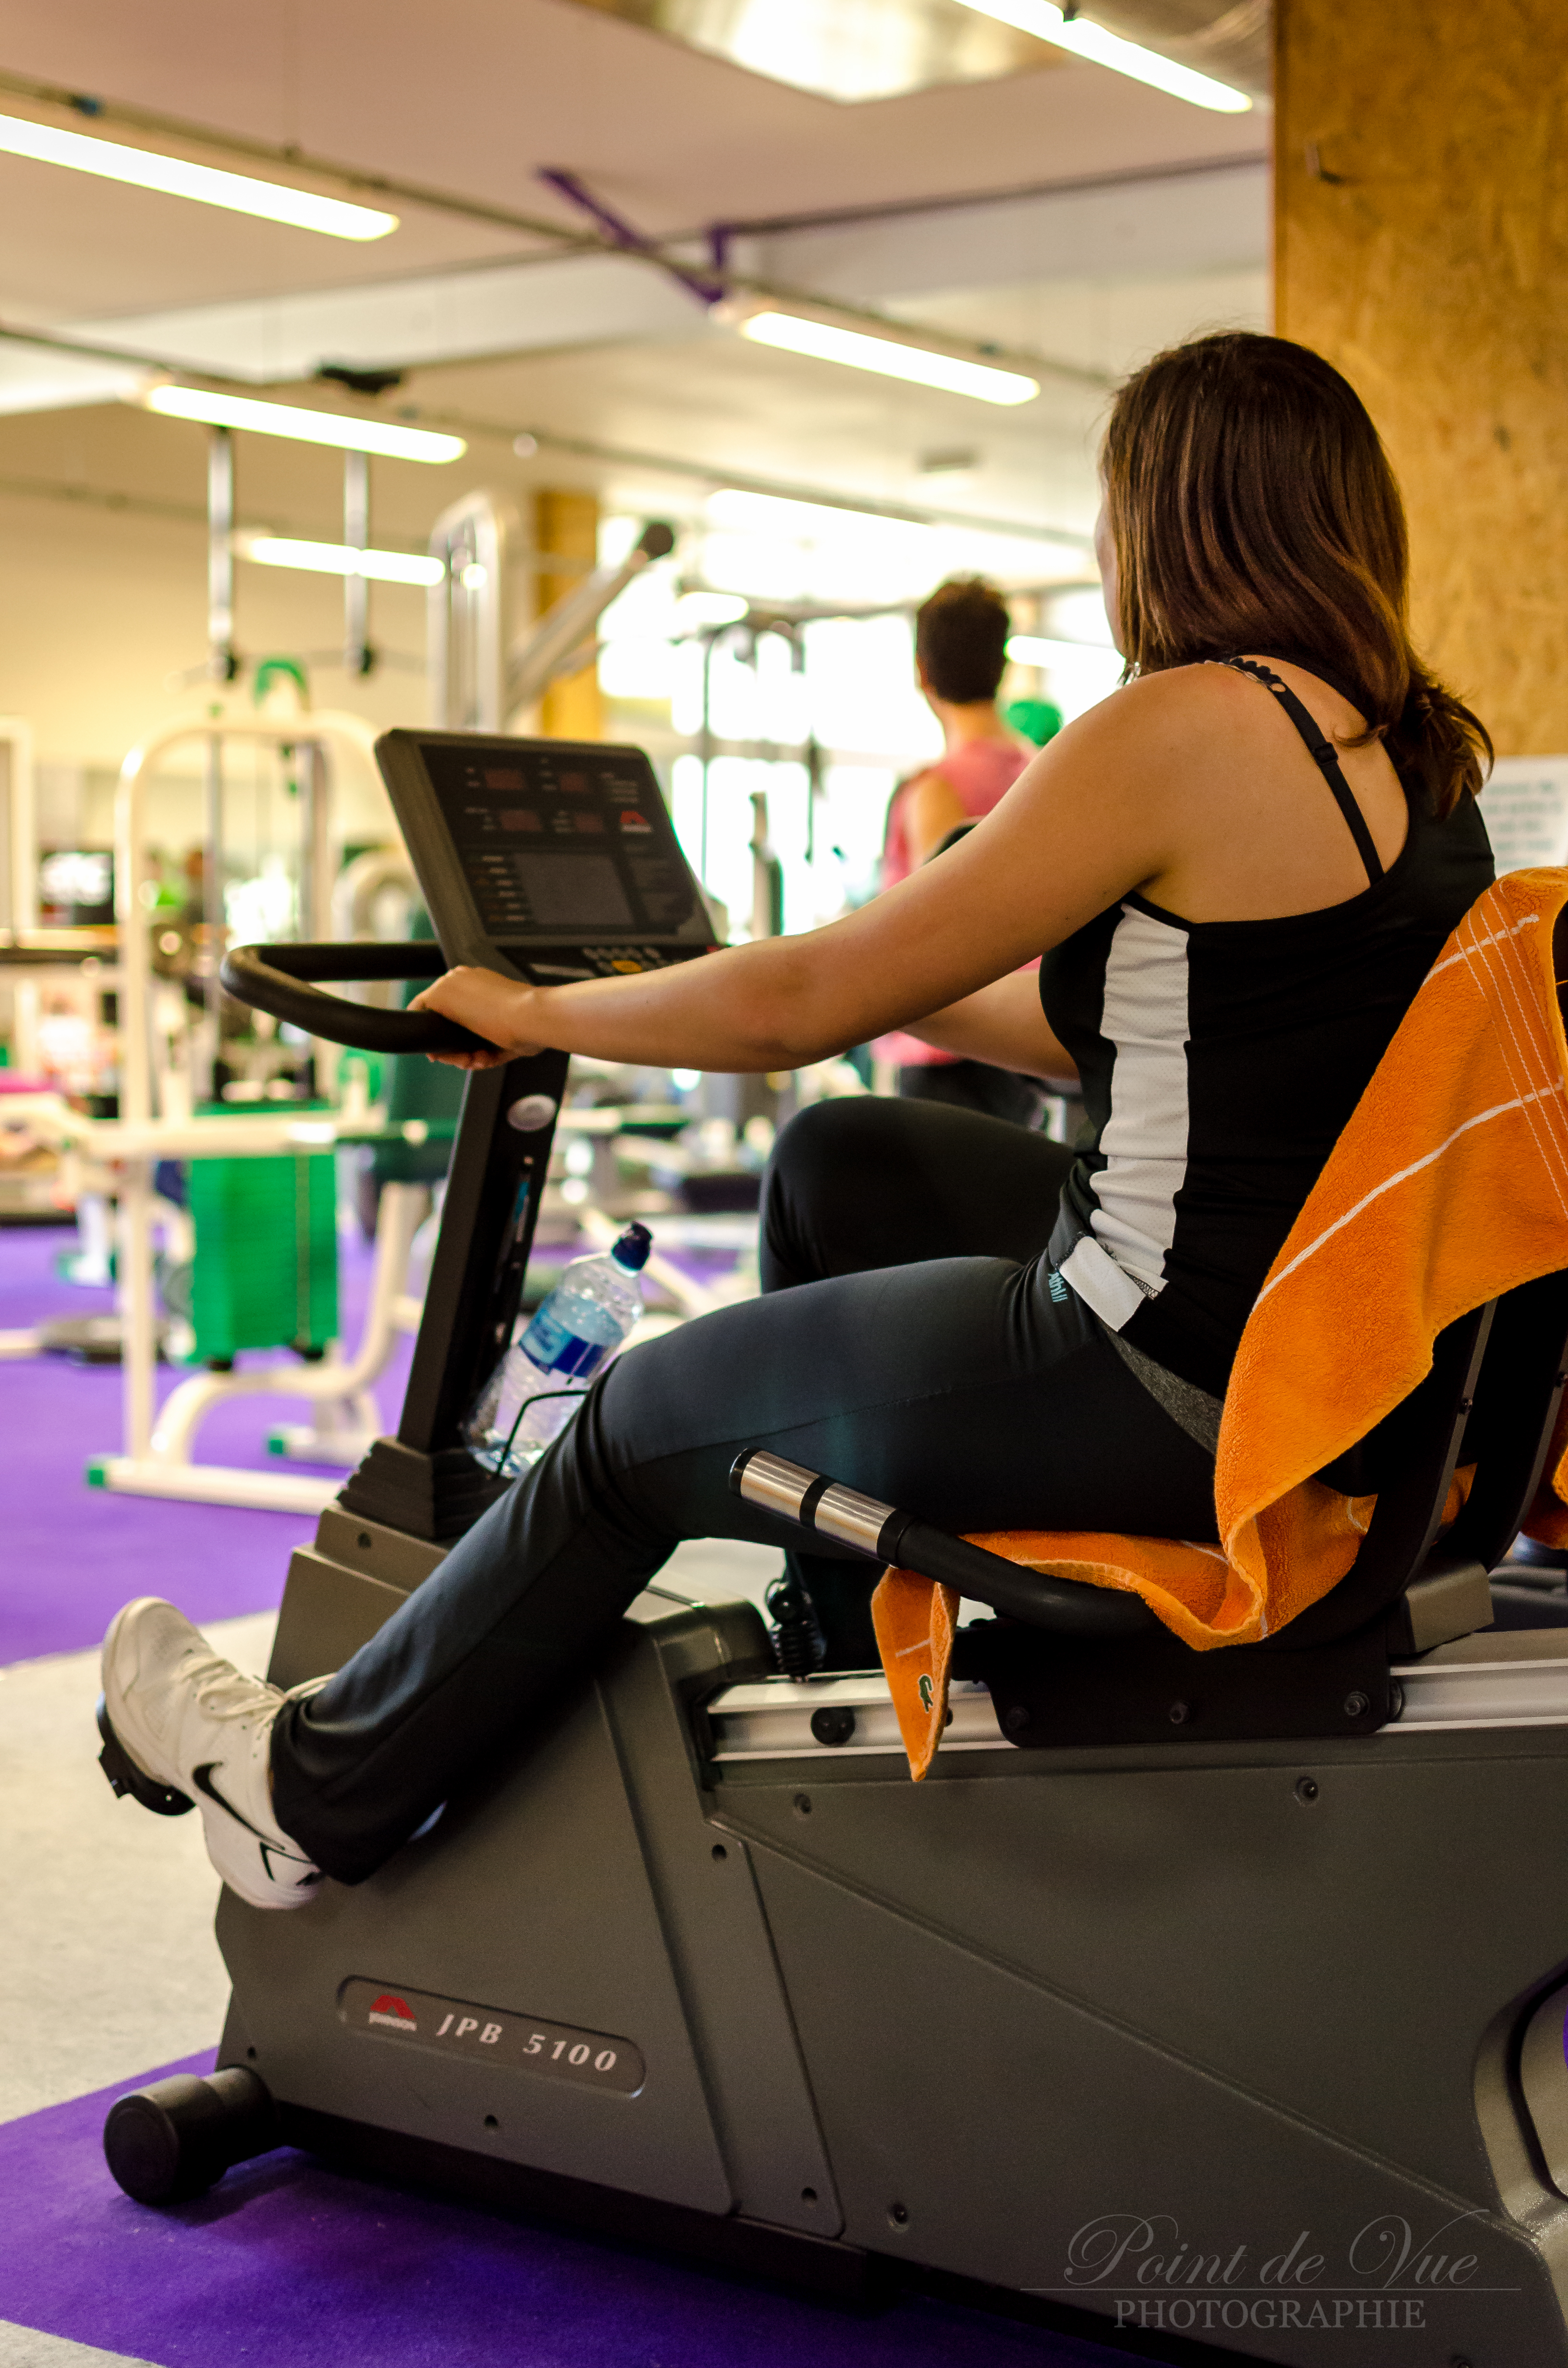 Salle de Sport Fitness Musculation Cardio - Castres - Lagarrigue